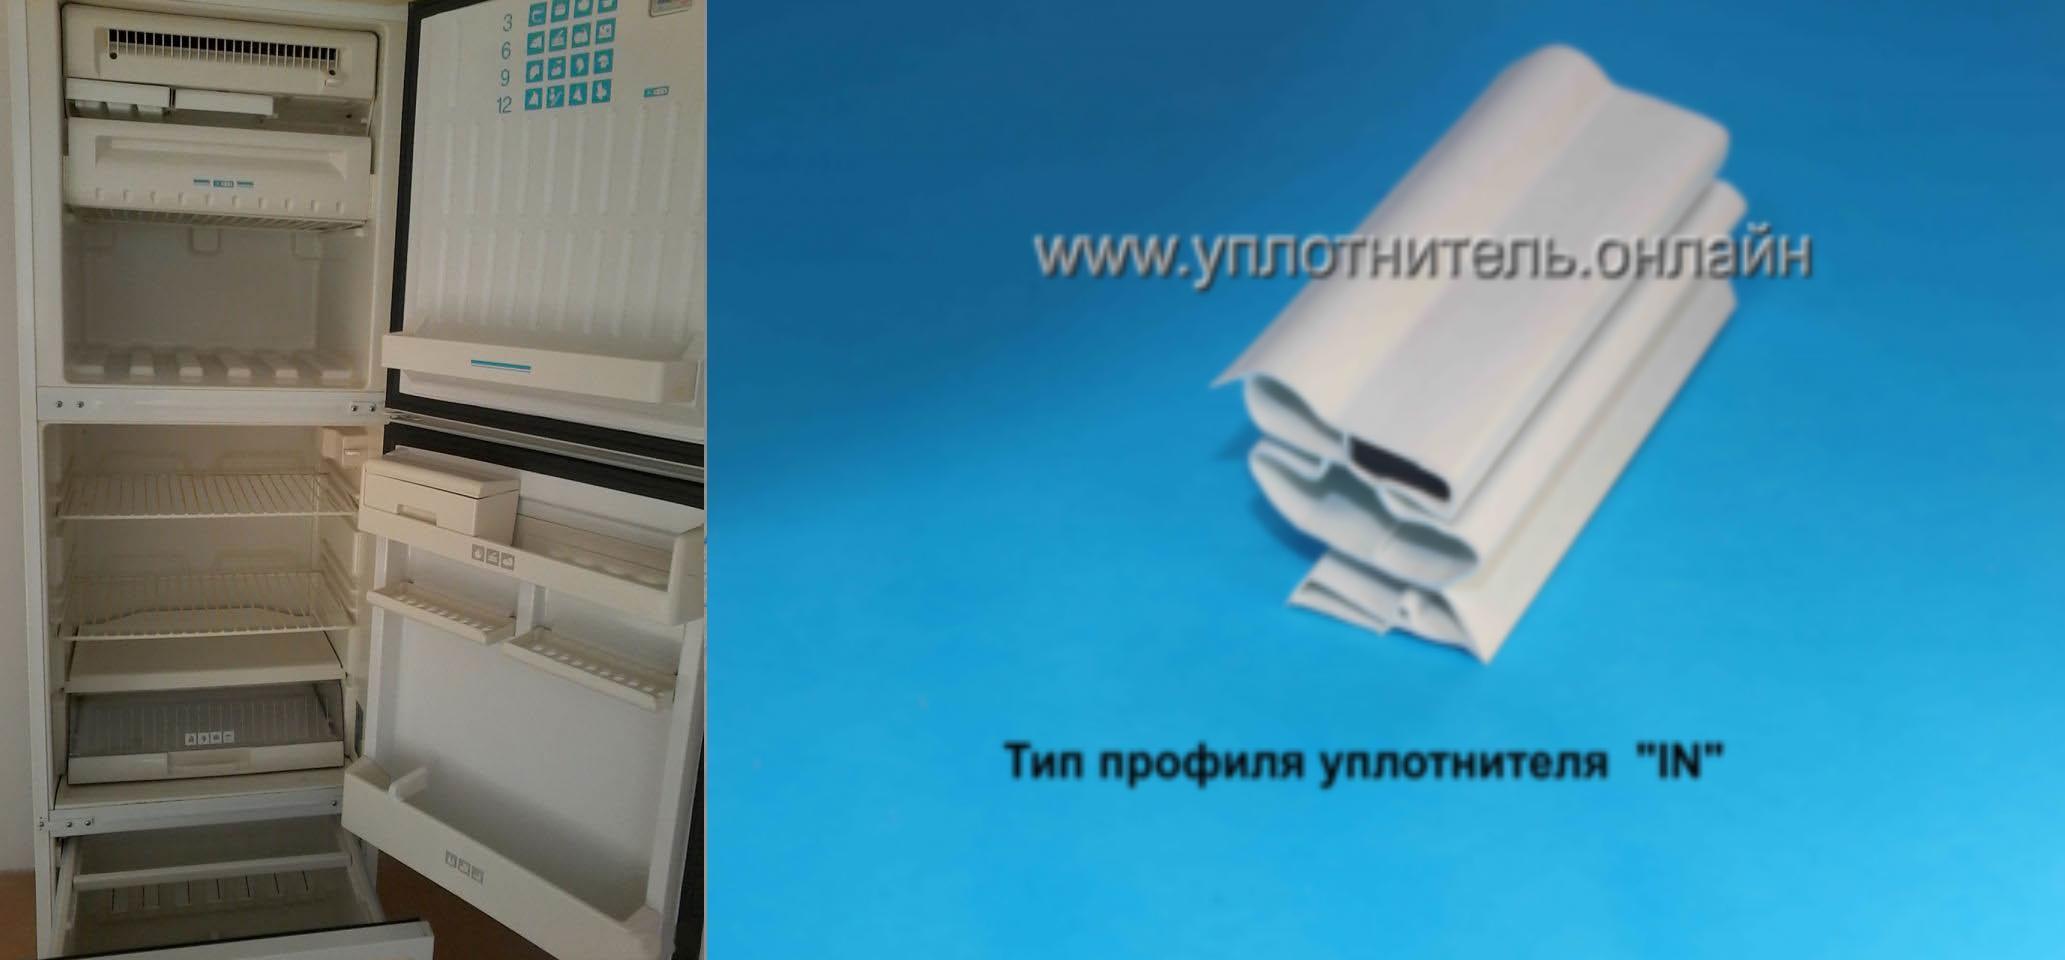 Ремонт холодильников stinol 102 своими руками